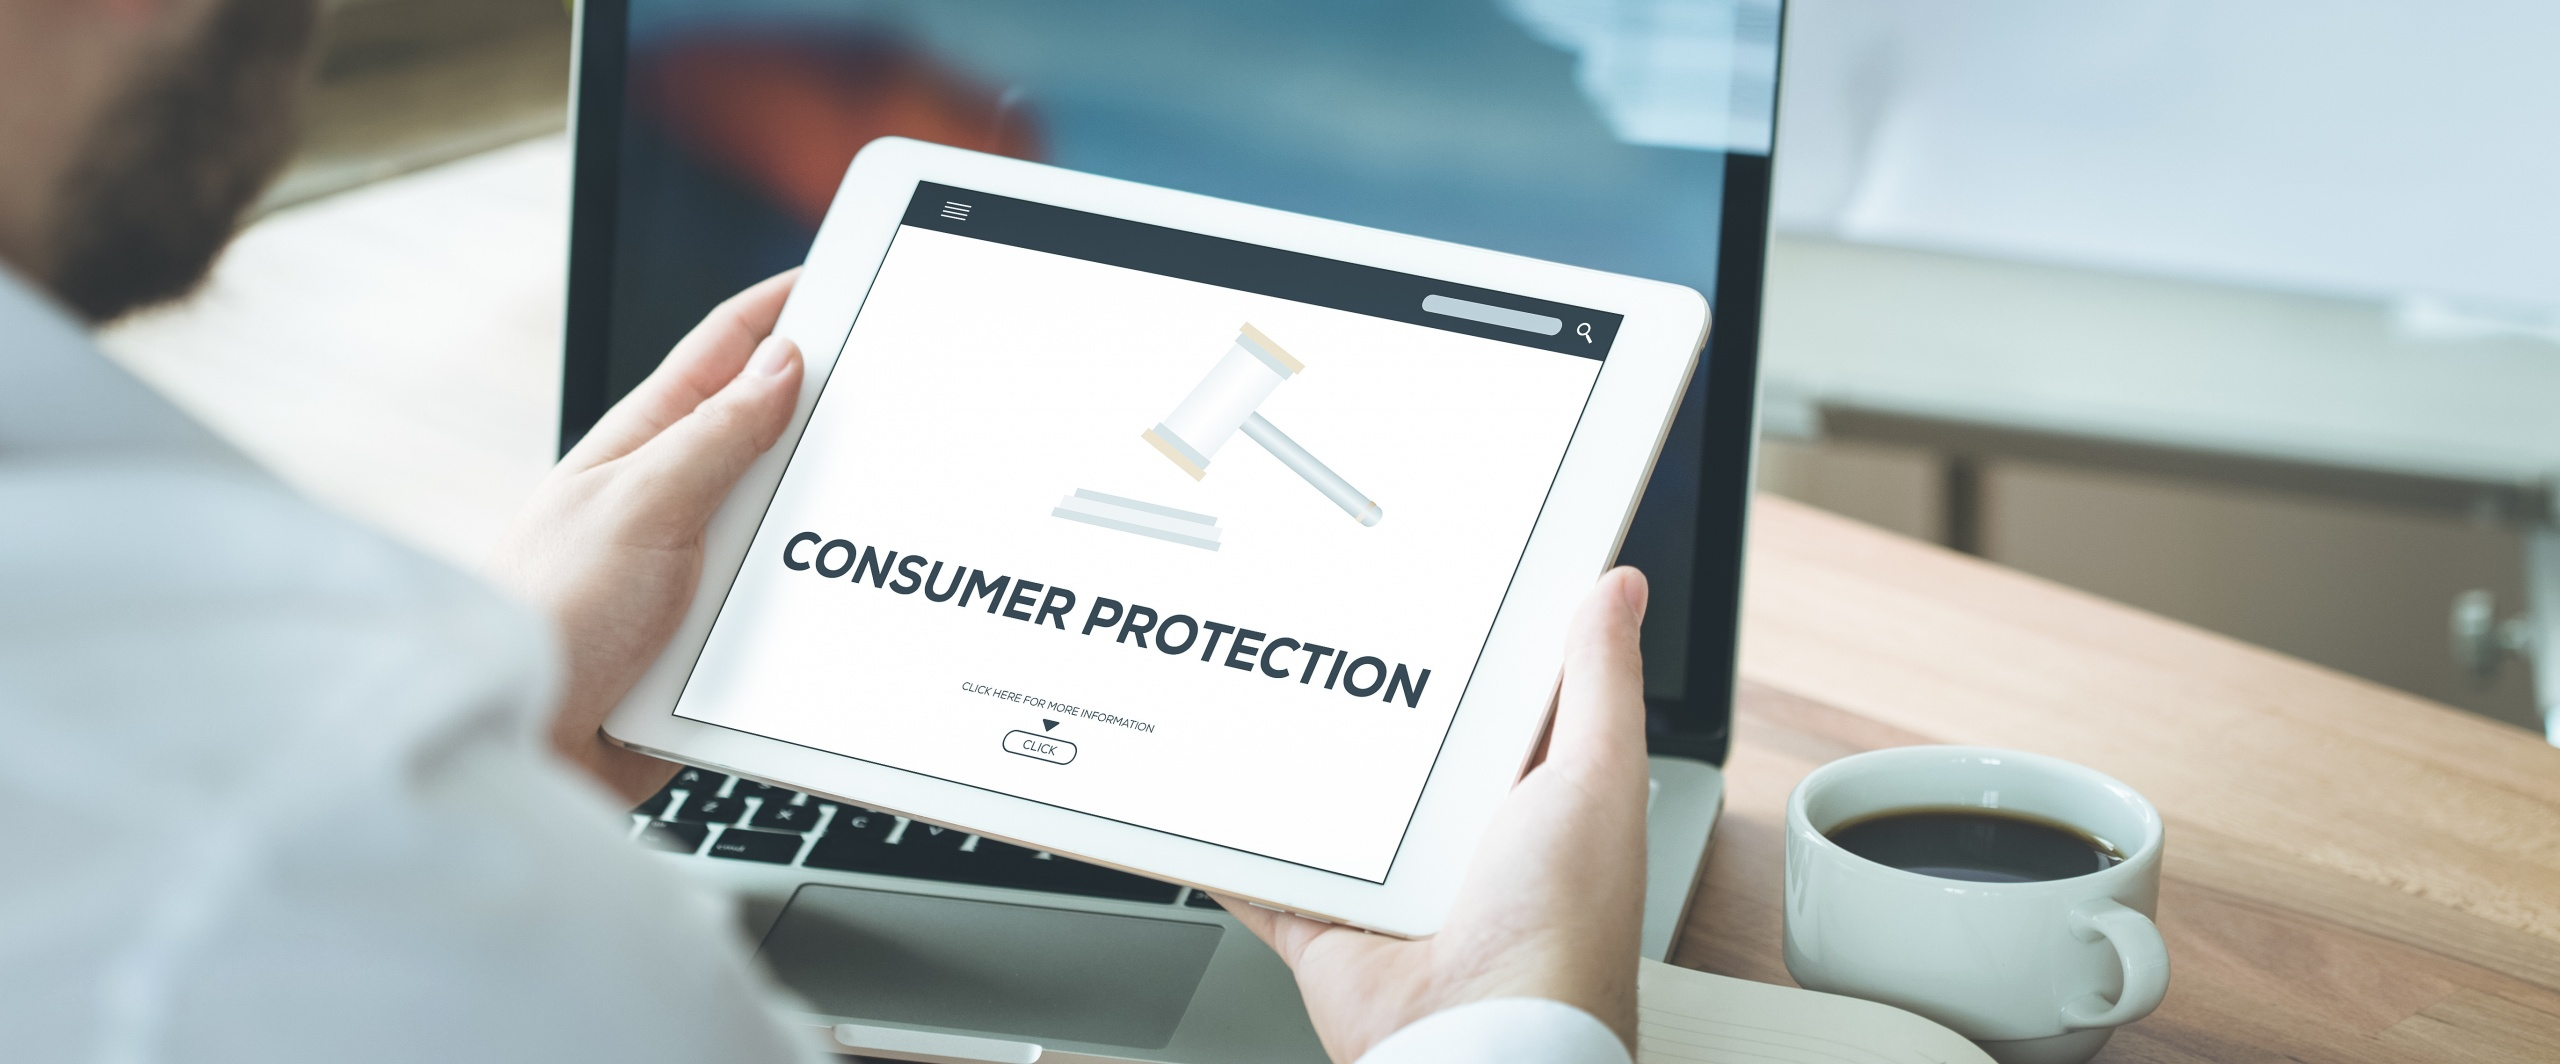 California Consumer Privacy Act (CCPA)- Consumer Protection